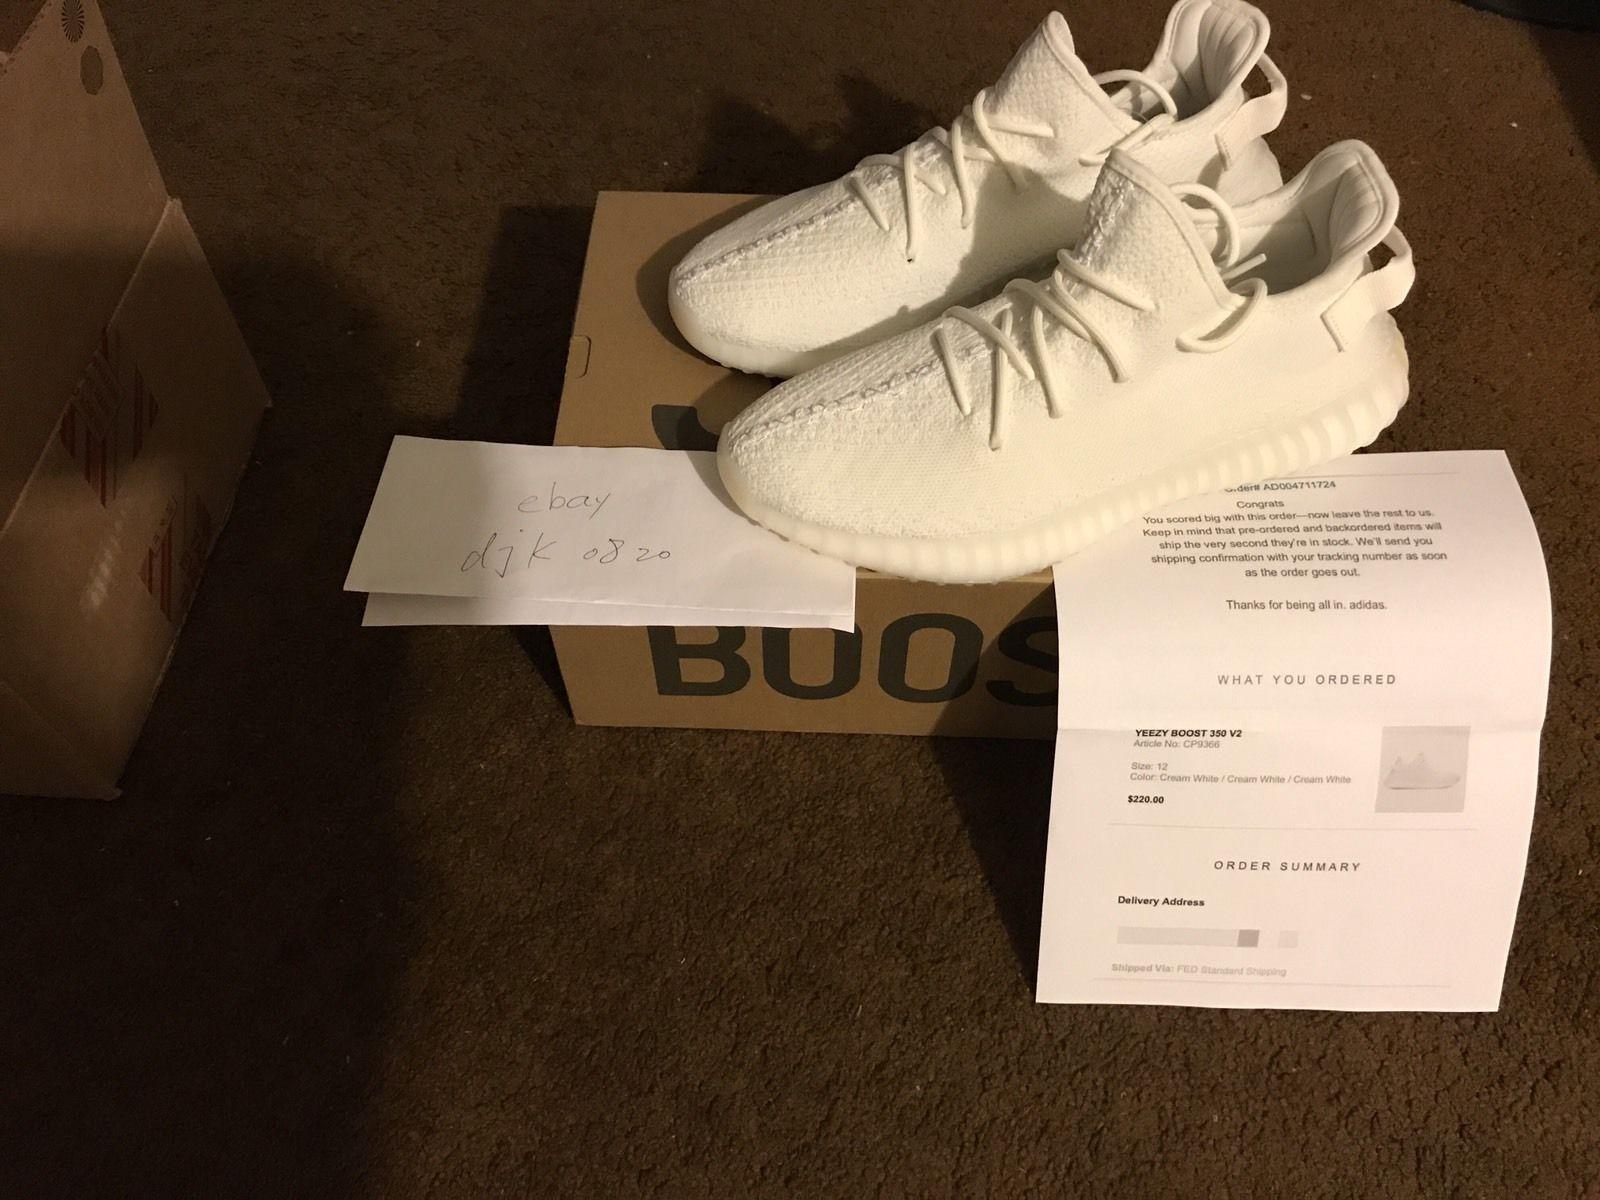 ebb3360f891d0 ... cheap adidas yeezy boost 350 v2 cream white cp9366 us mens size 12  f9338 aeeb7